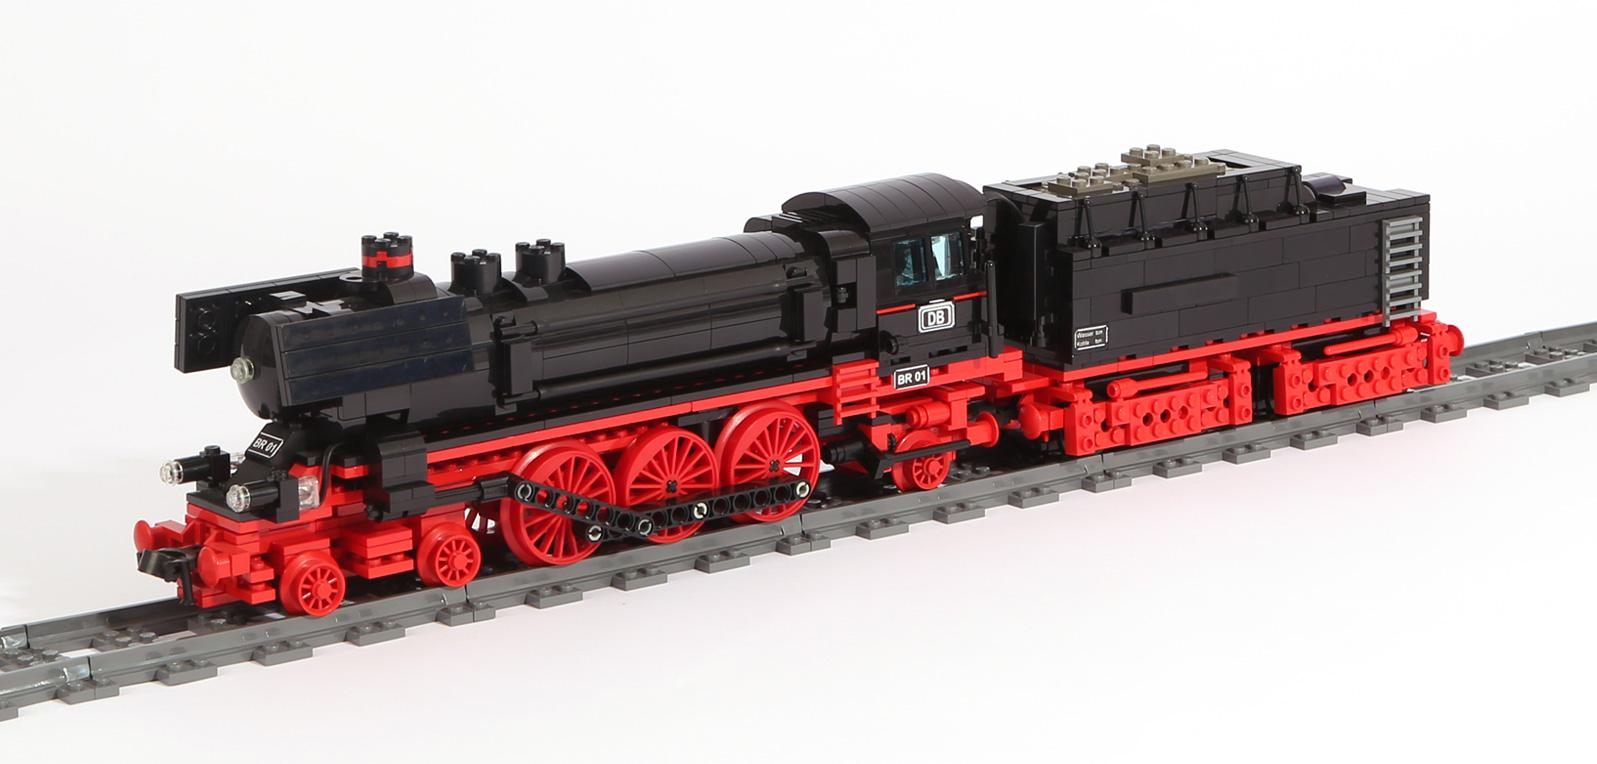 Dampflok-Baureihe BR 01 (eigene Modelle)